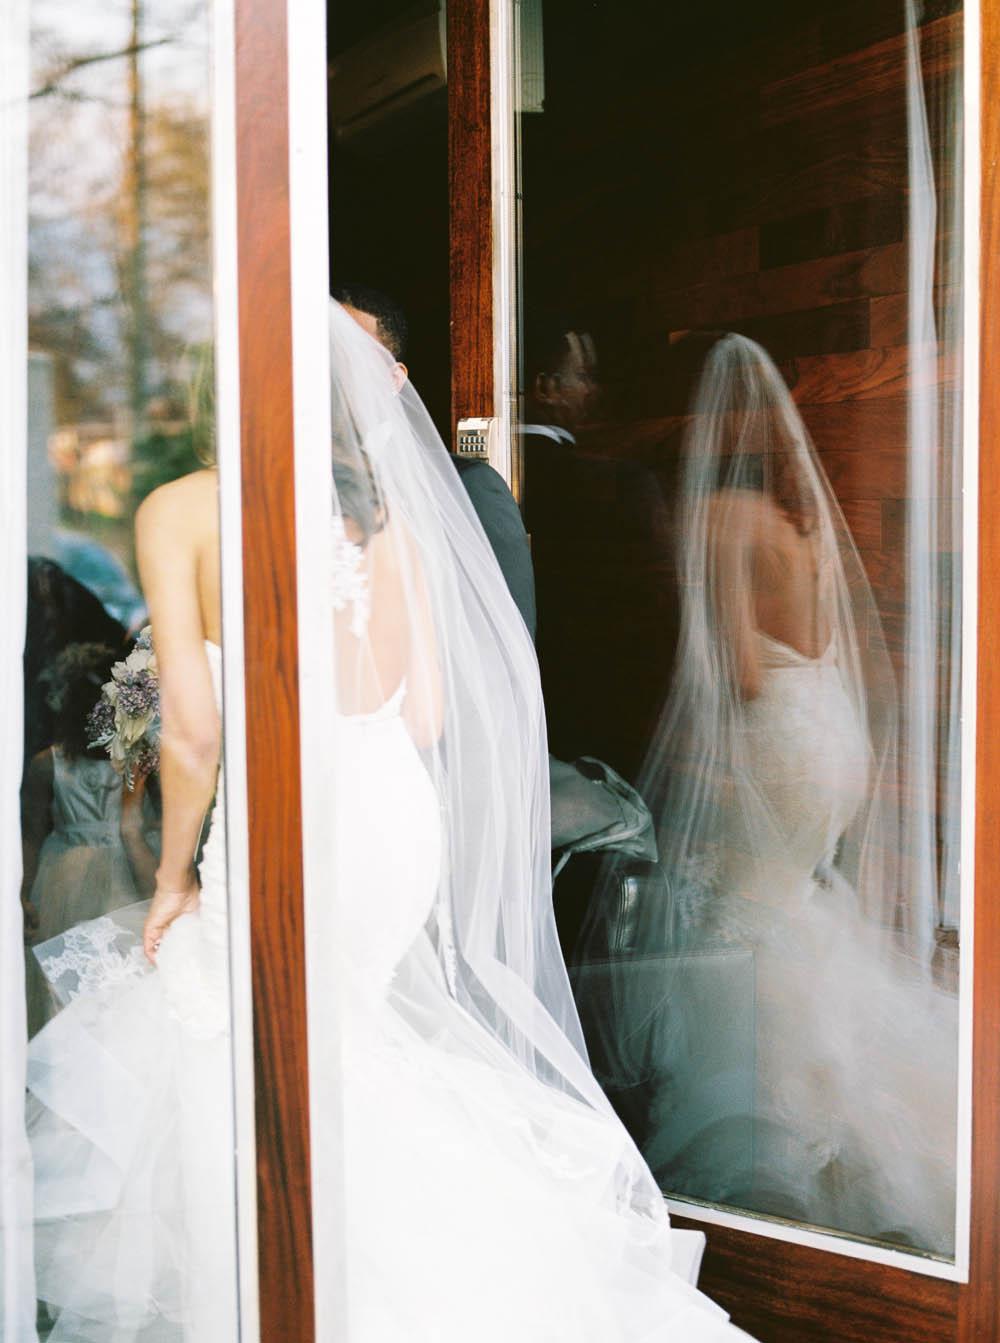 nashville ruby film documentary wedding photographer heartfelt real moments african american wedding munalachi bride ©2016abigailbobophotography-38.jpg